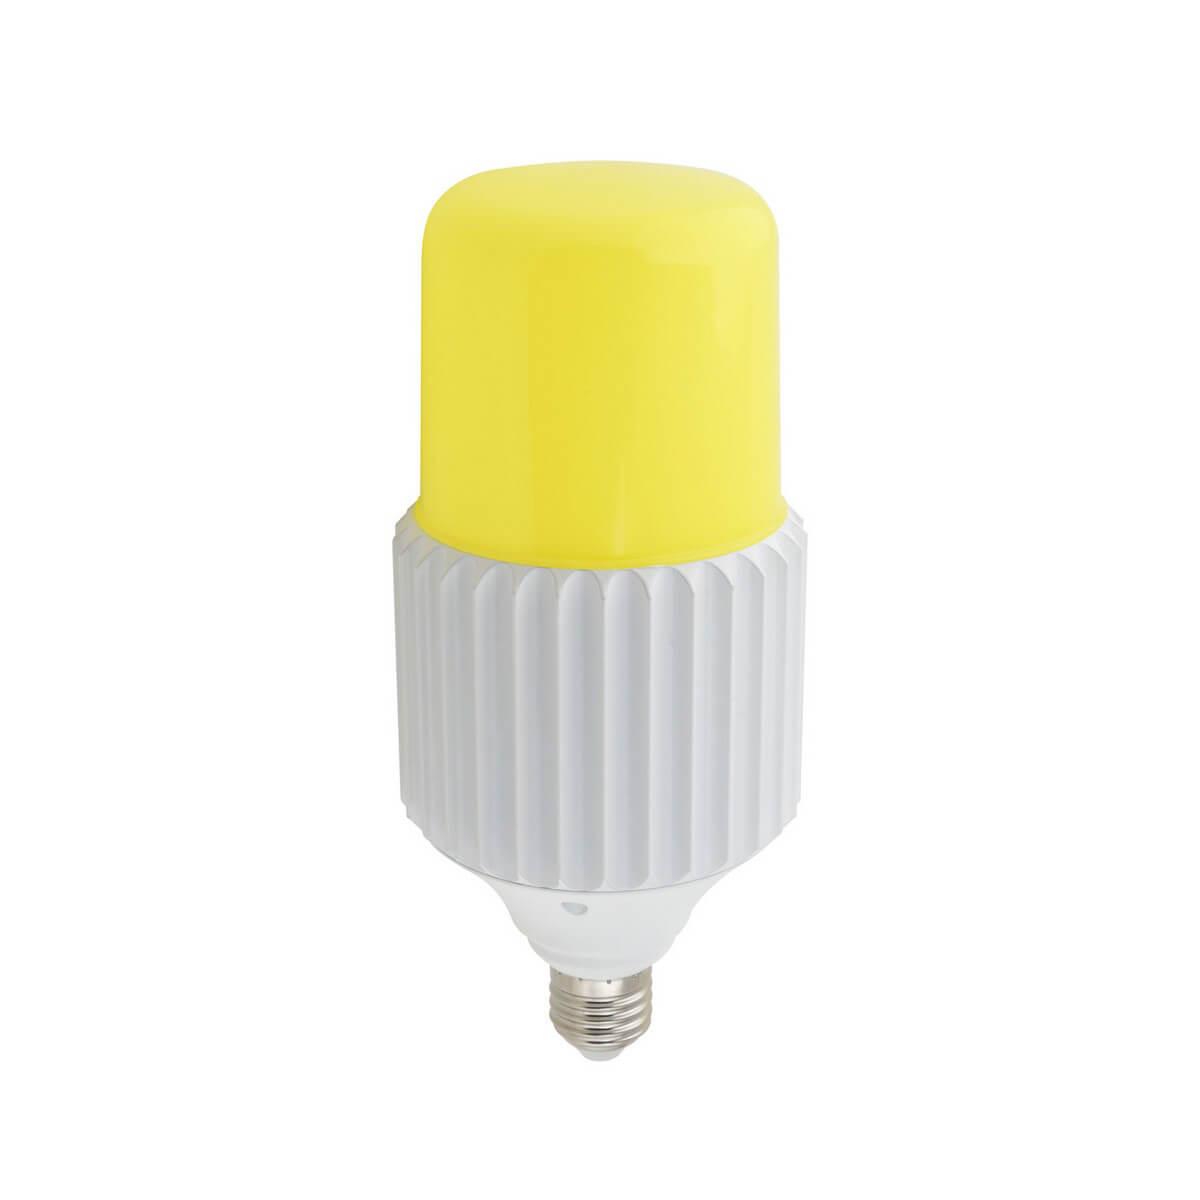 Лампа светодиодная сверхмощная (UL-00004063) Uniel E27 50W 6000K желтая LED-MP200-50W/6000K/E27/PH ALP06WH